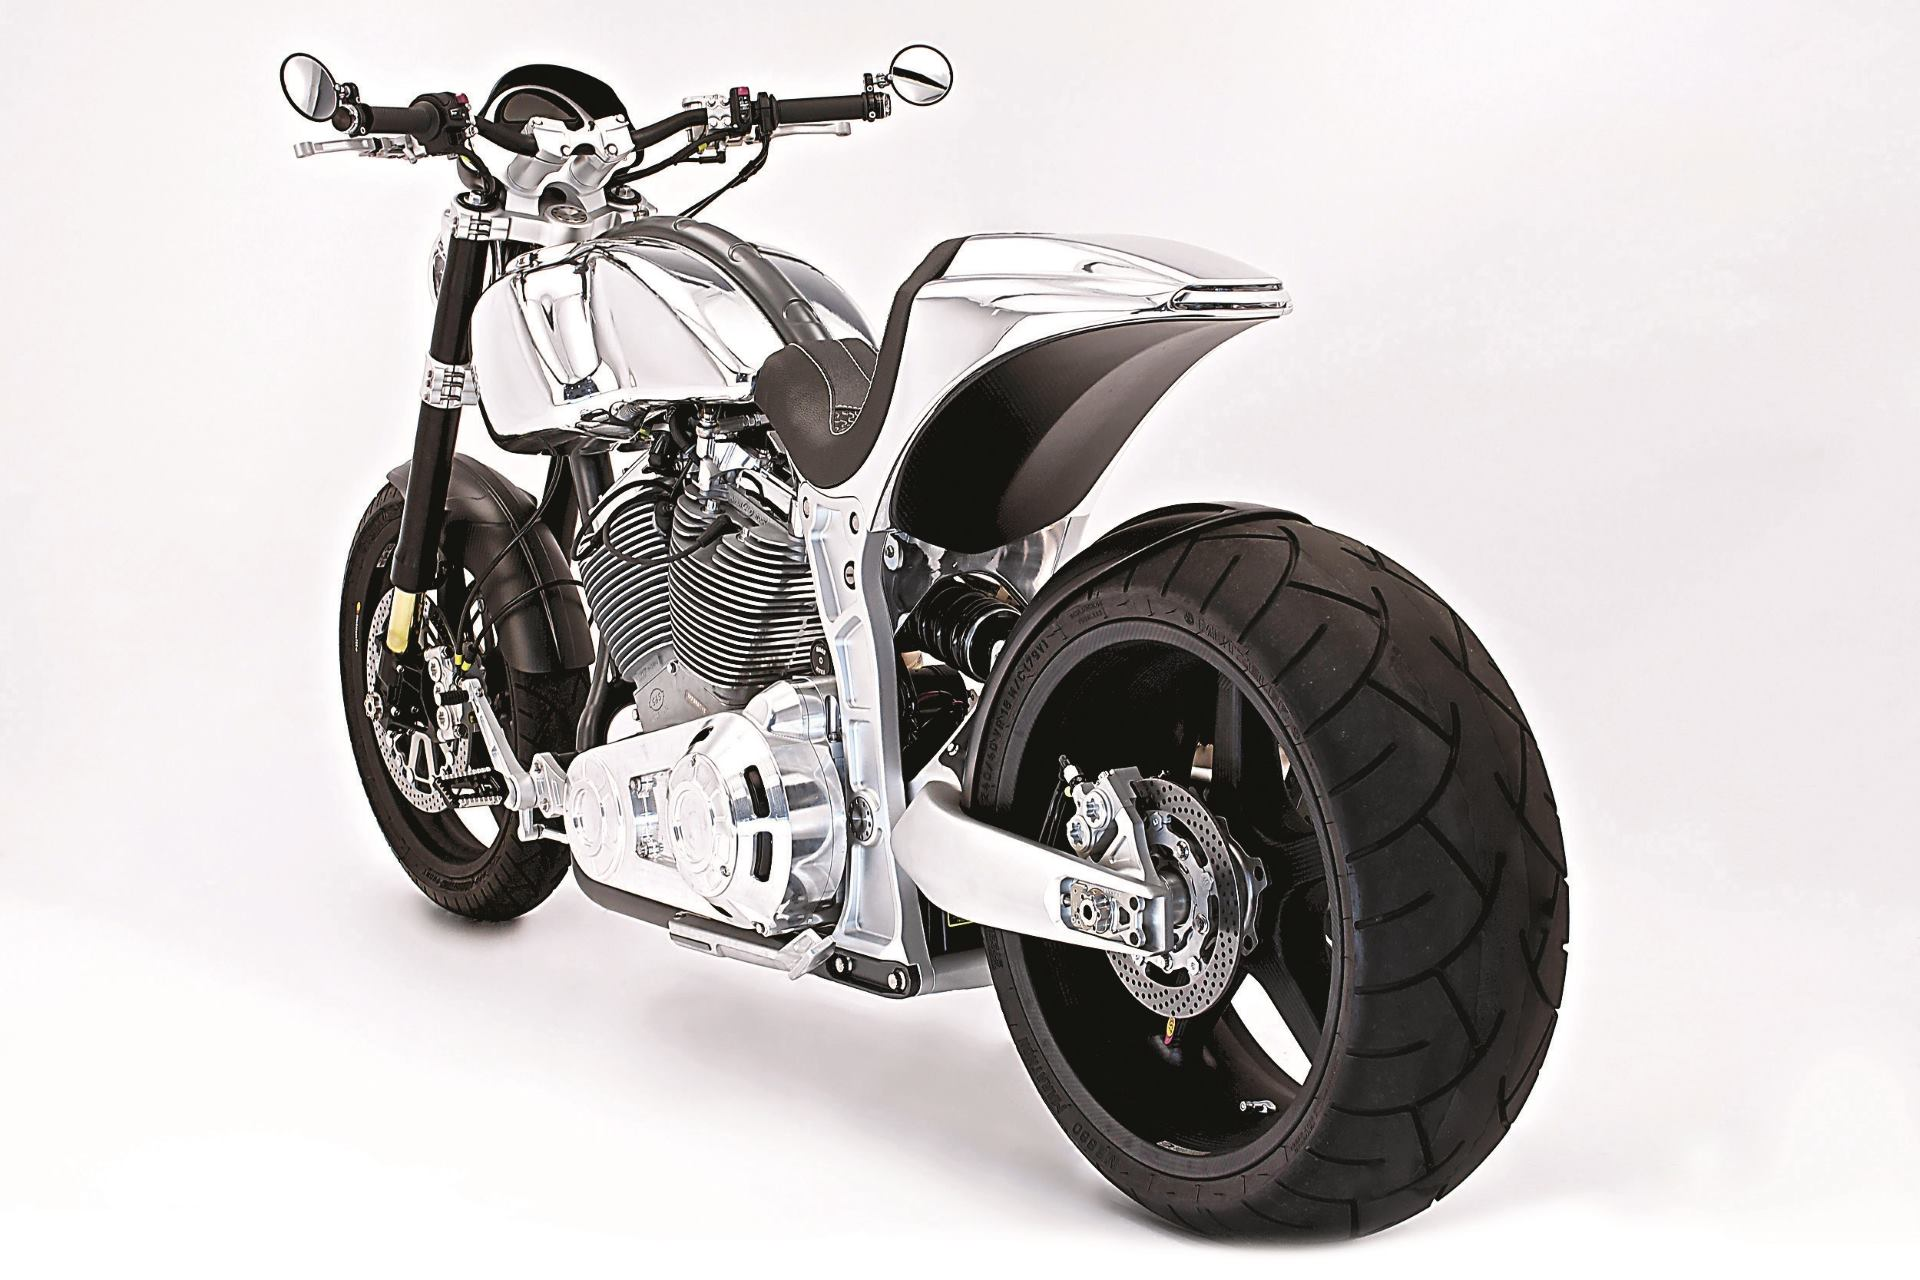 Arch KRGT-1: Zvijer na dva kotača iz radionice Keanu Reevesa